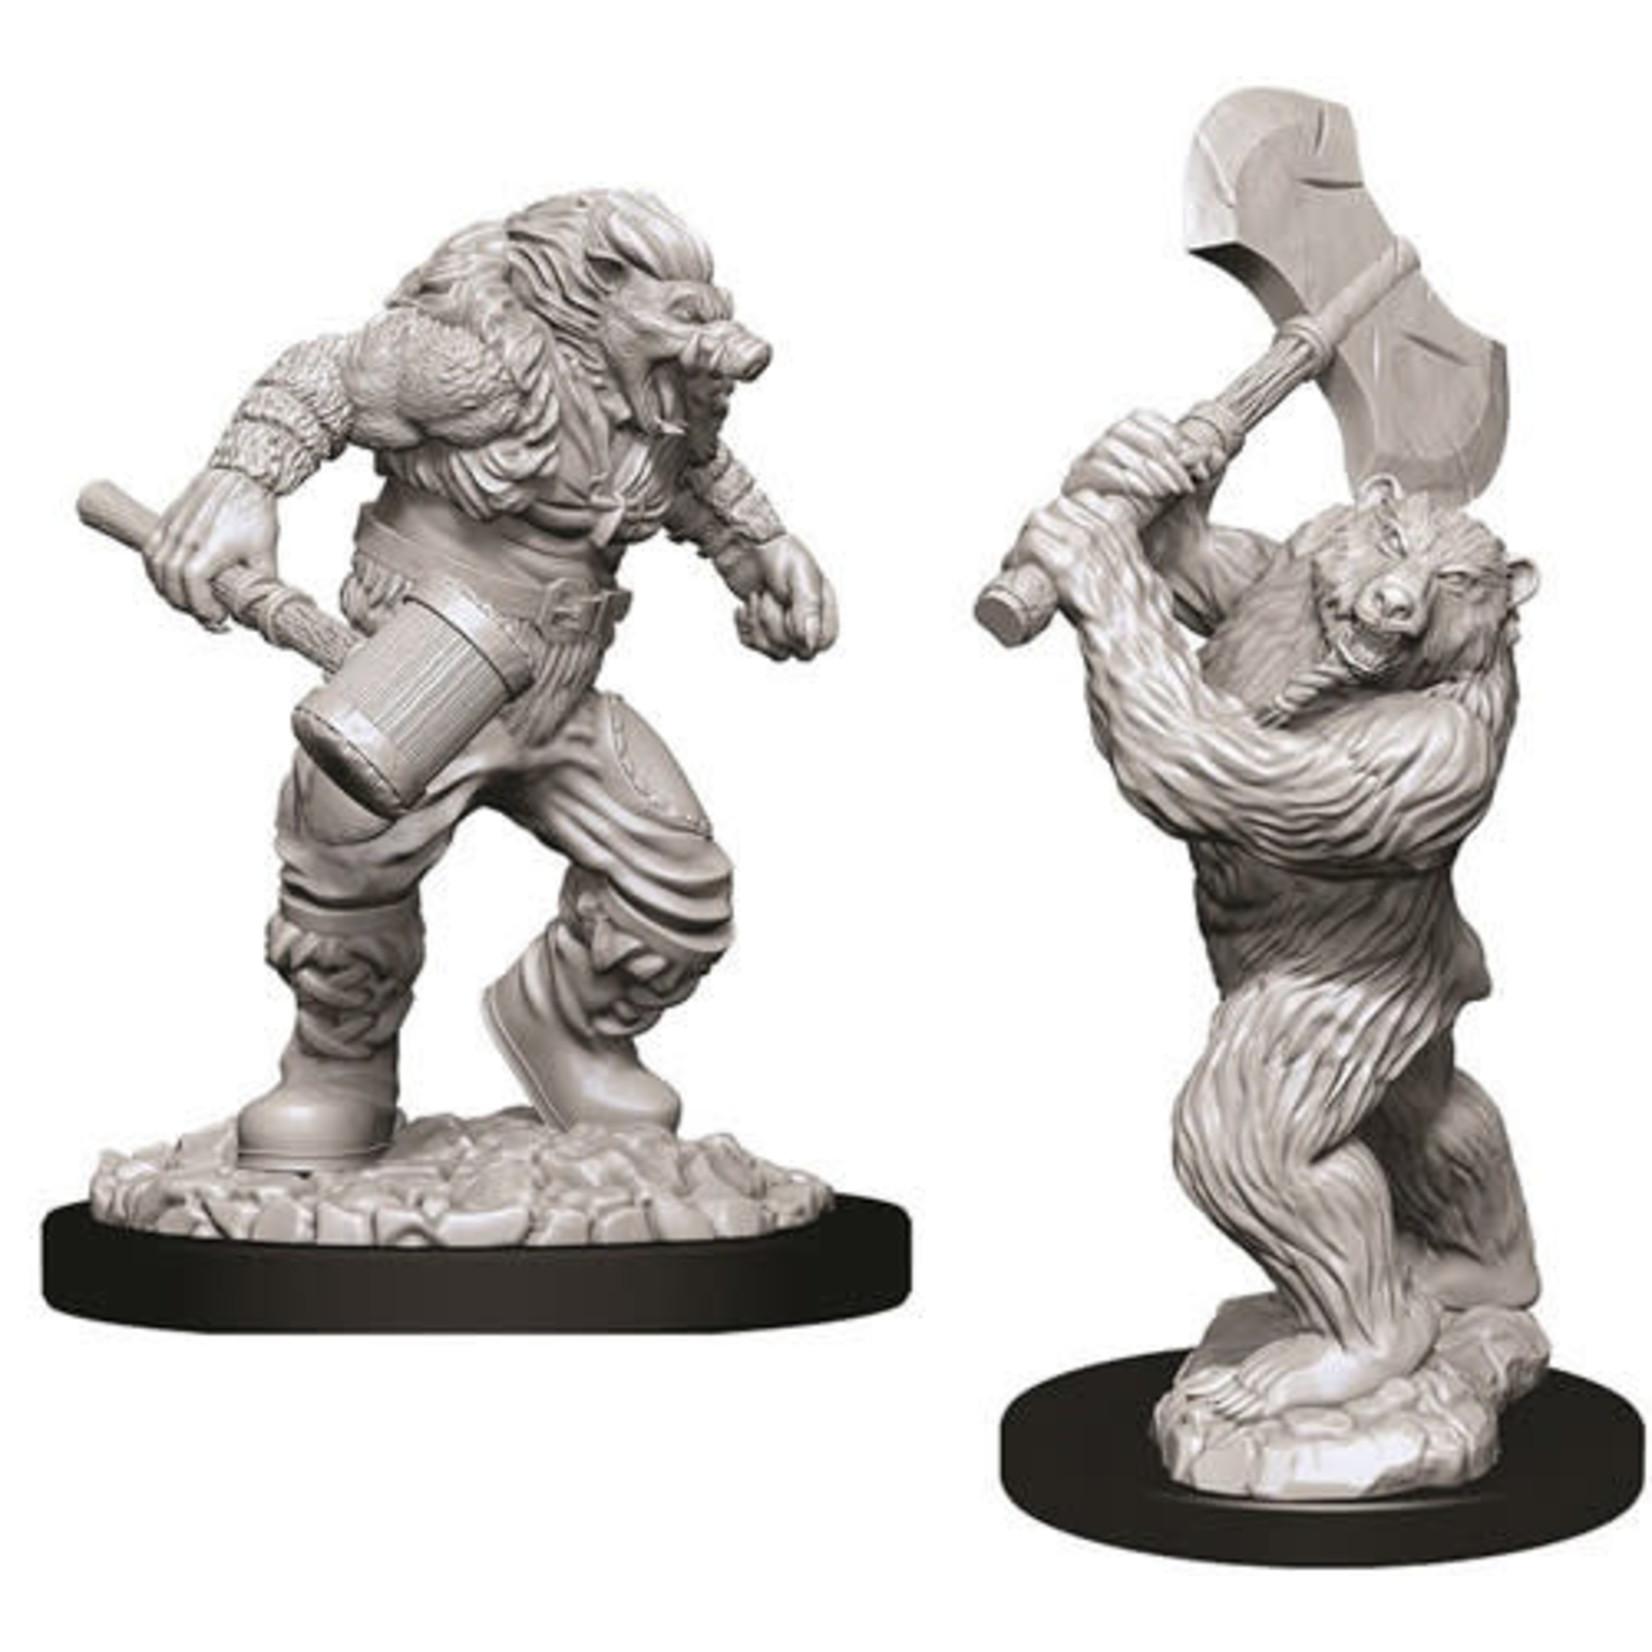 D&D Unpainted Minis: Wereboar & Werebear (Wave 9)